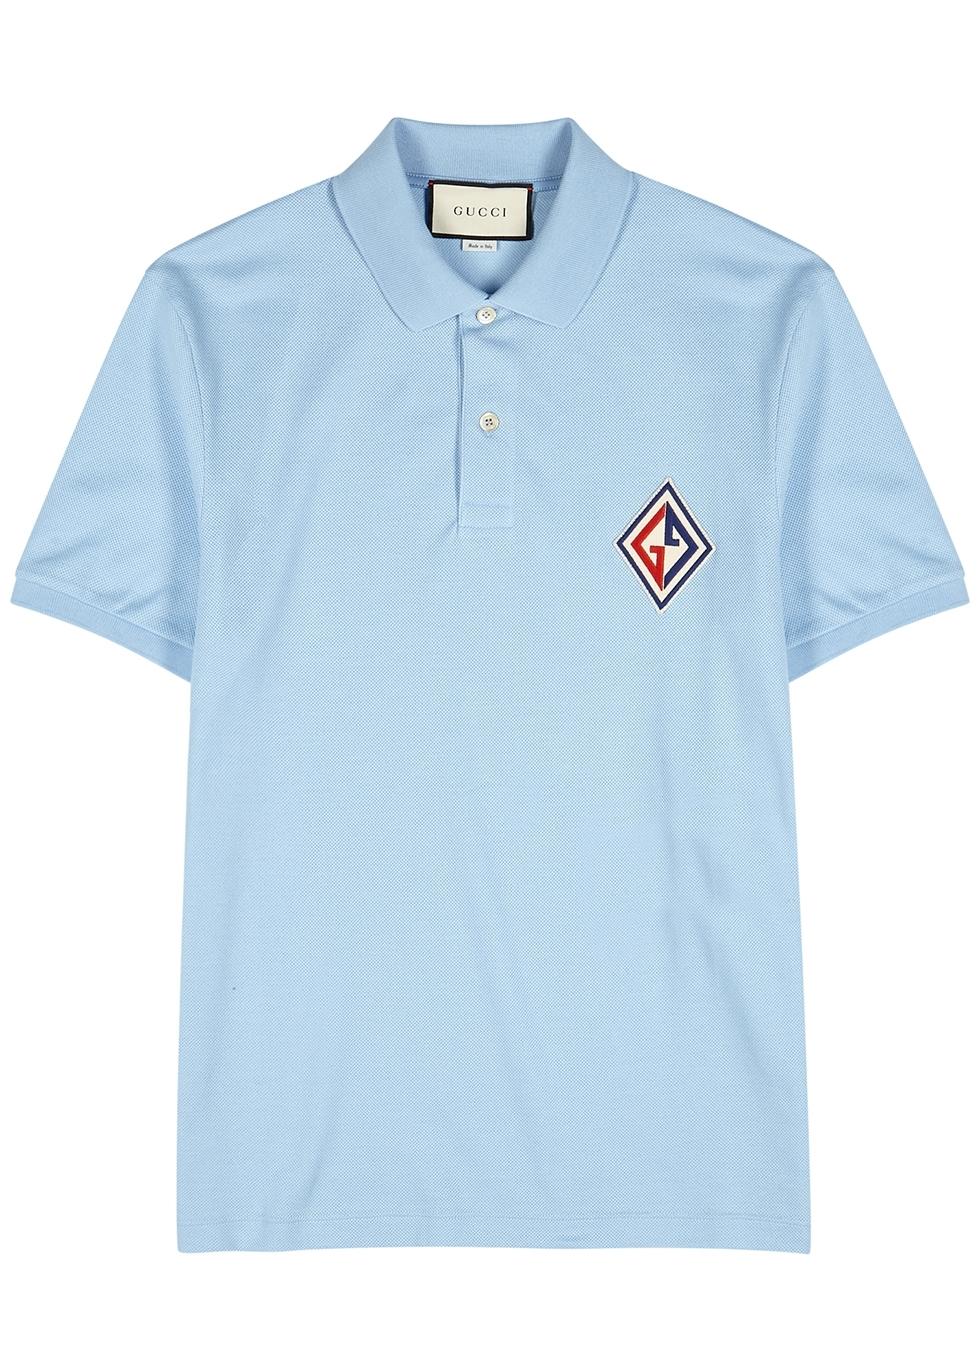 50a3655d732c Men's Designer Polo Shirts - Polo Shirts For Men - Harvey Nichols